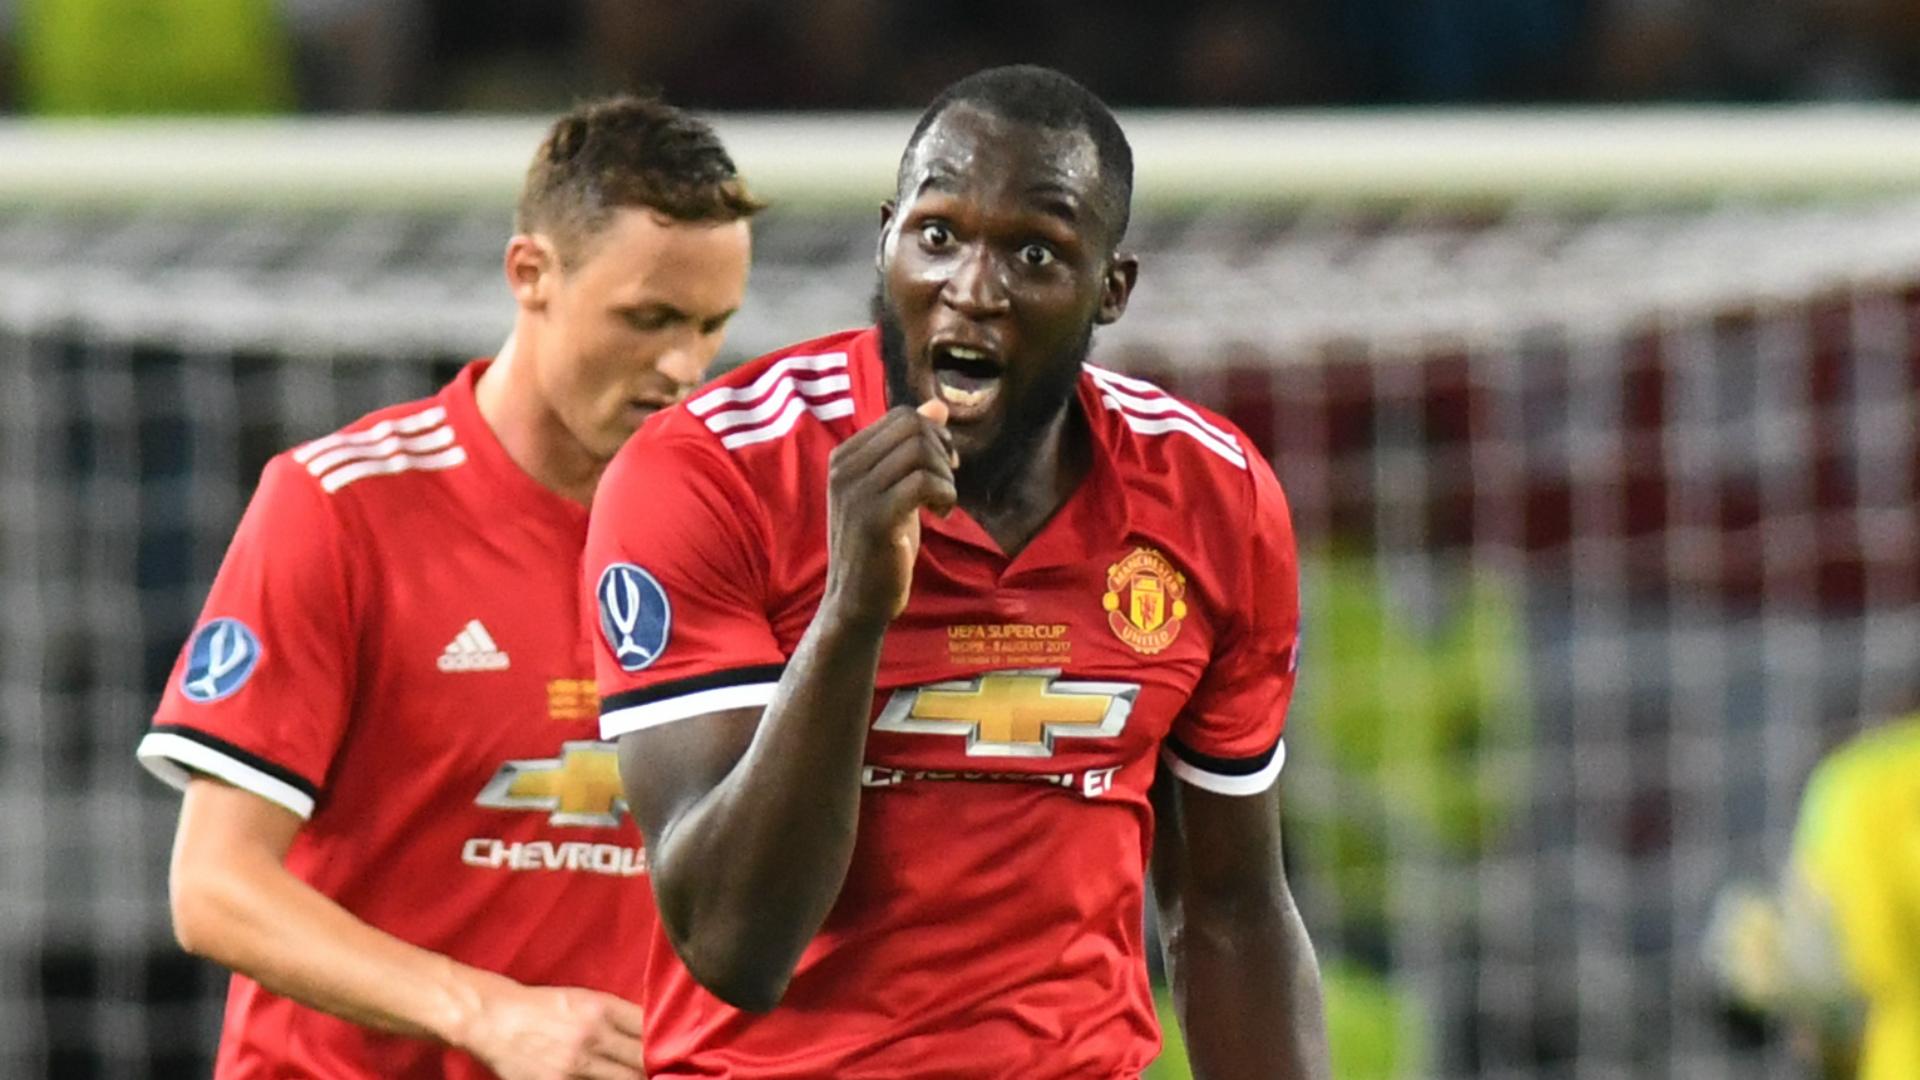 I Won't Moan, 75% Is Fine - Jose Mourinho Assesses Transfer Market Activity